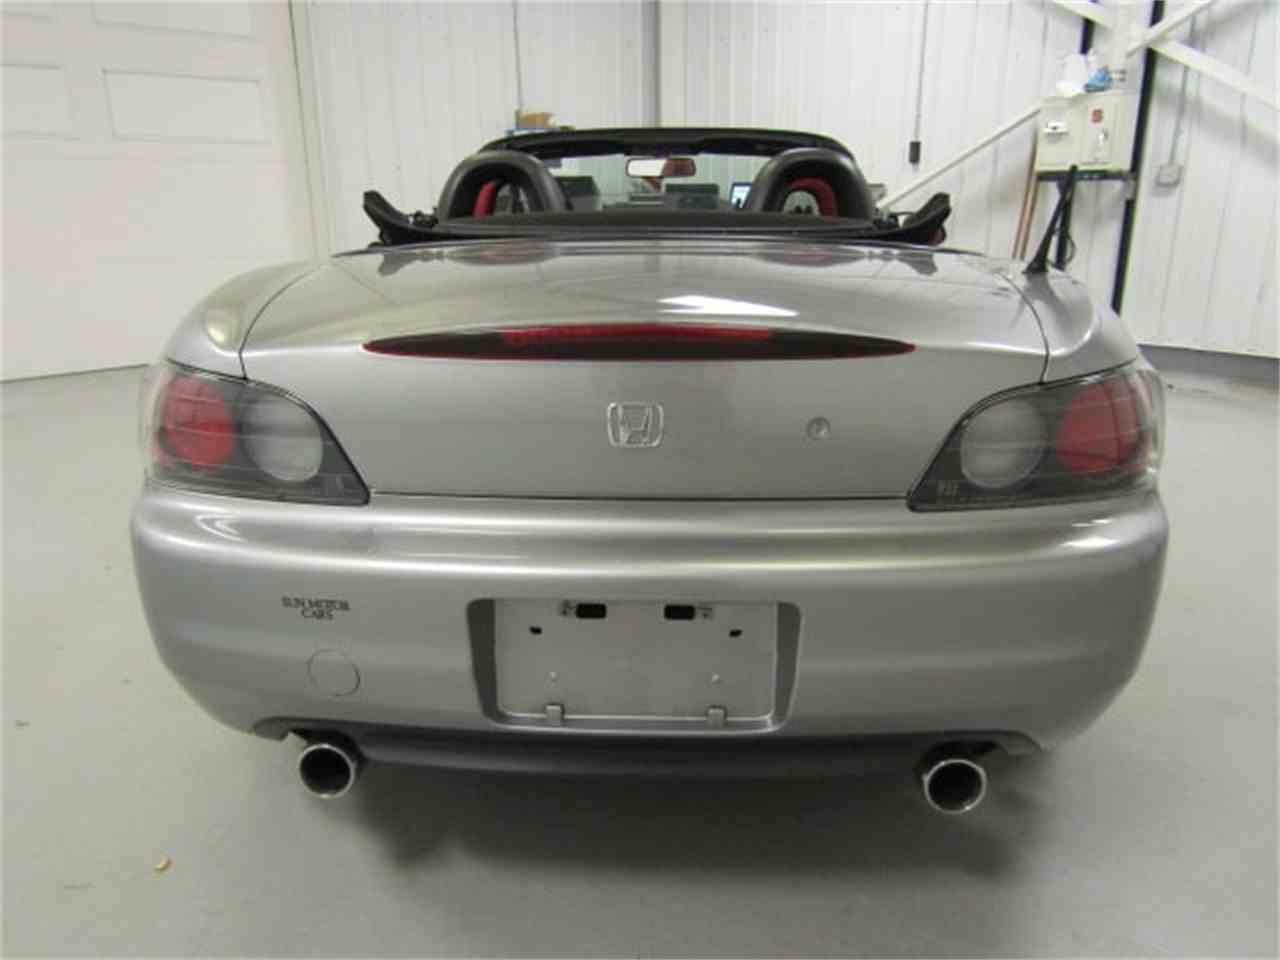 Large Picture of 2001 Honda S2000 located in Christiansburg Virginia - $19,900.00 - LI1R